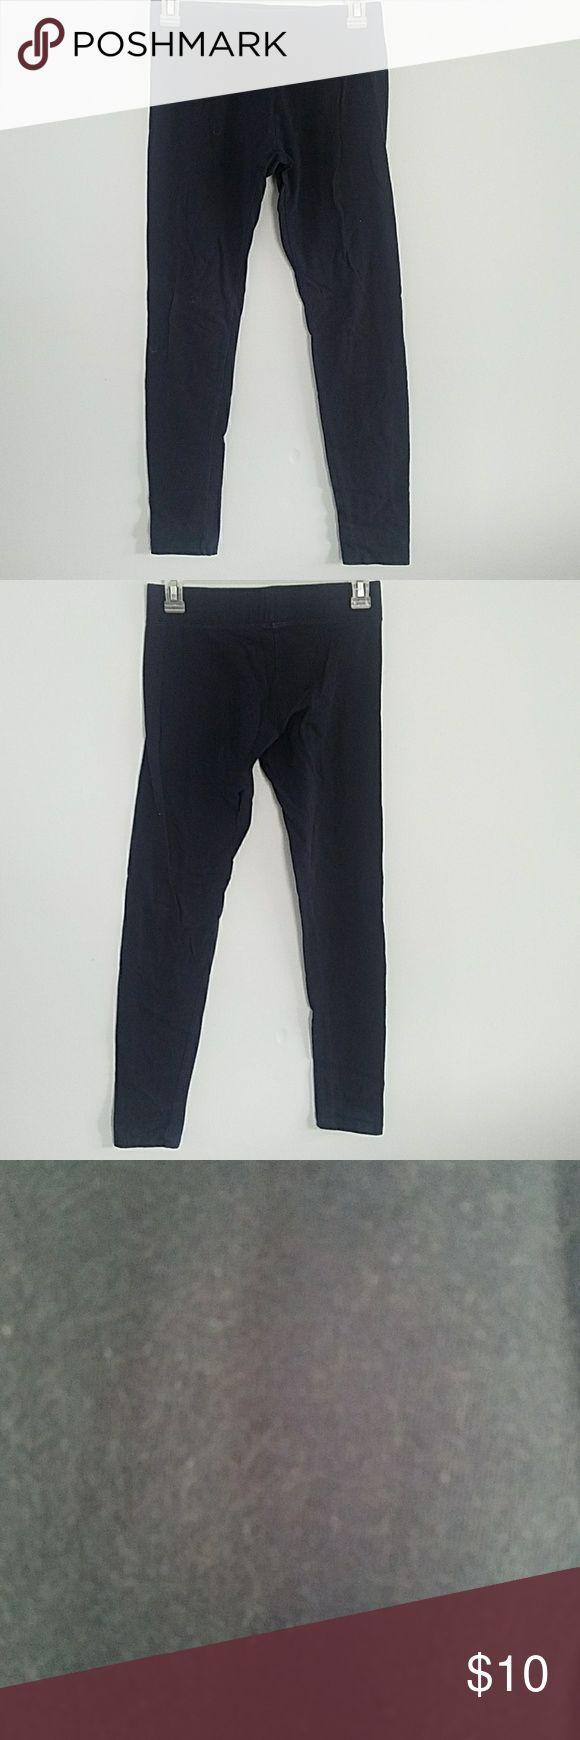 Navy Blue Leggings A bit see through. Should be worn under dresses, skirts, long cardigans, and long shirts. Vanity Pants Leggings